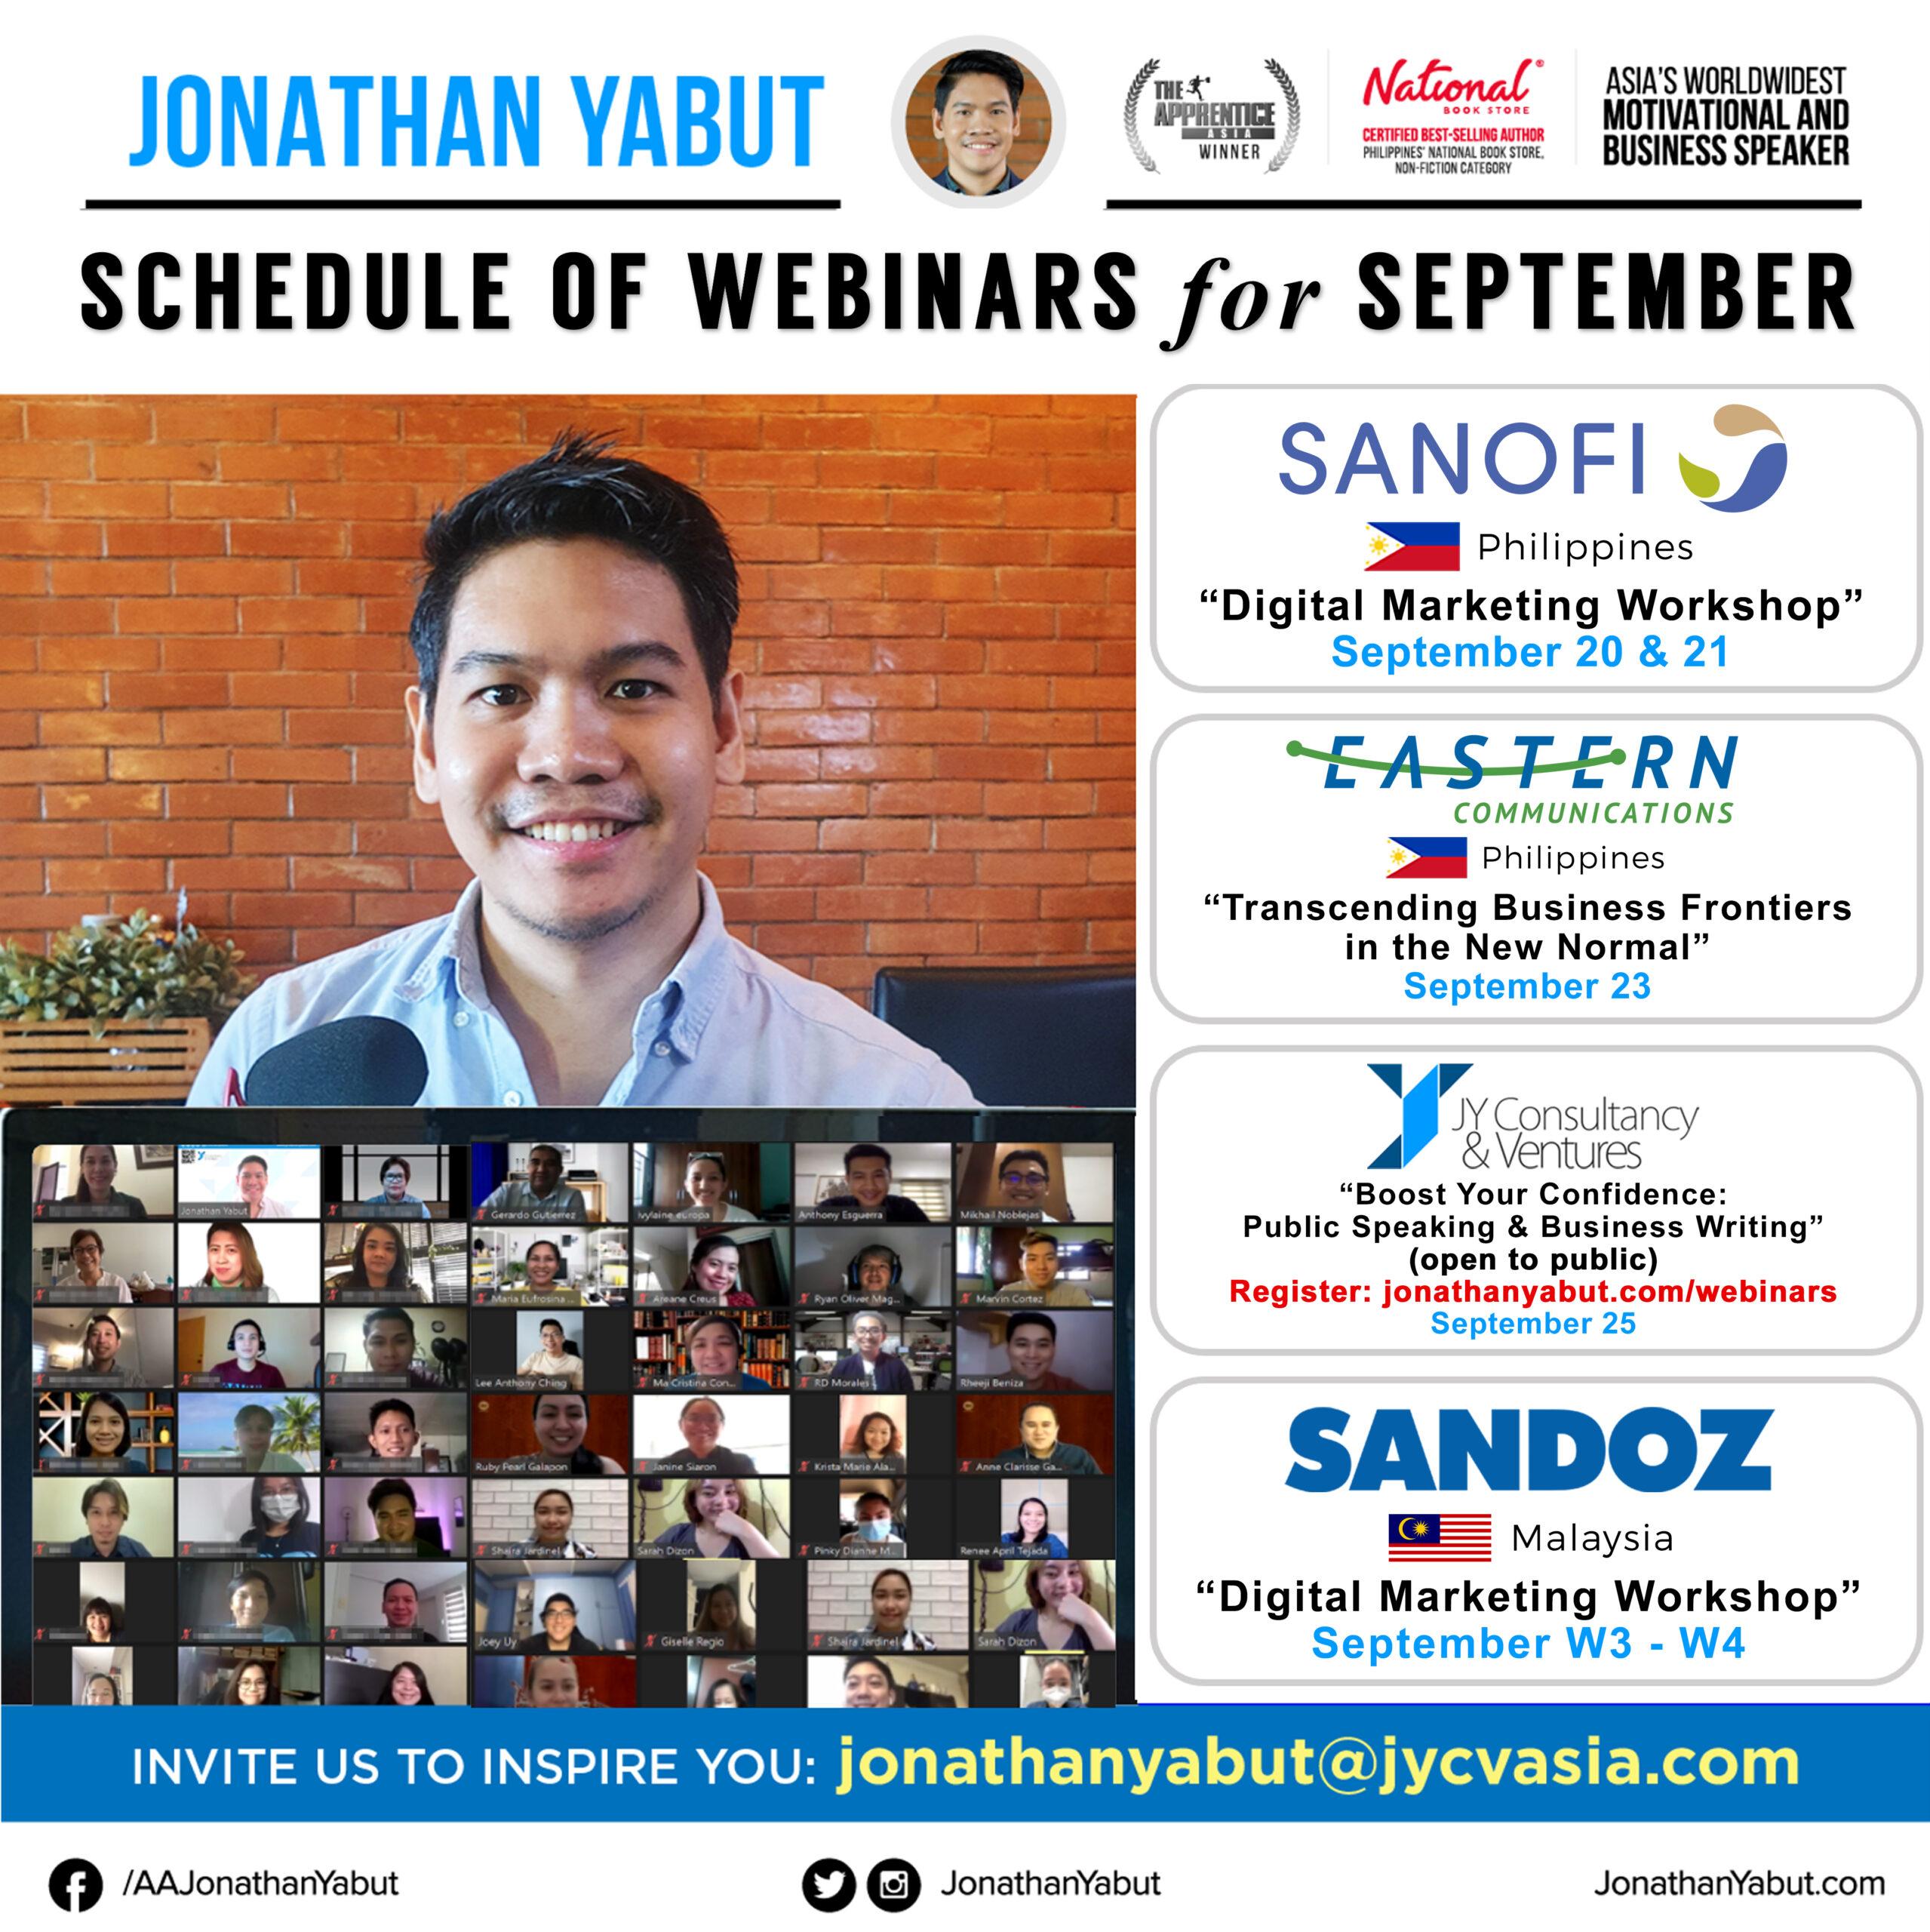 Jonathan Yabut motivational speaker asia philippines September webinars 4 IG Feed